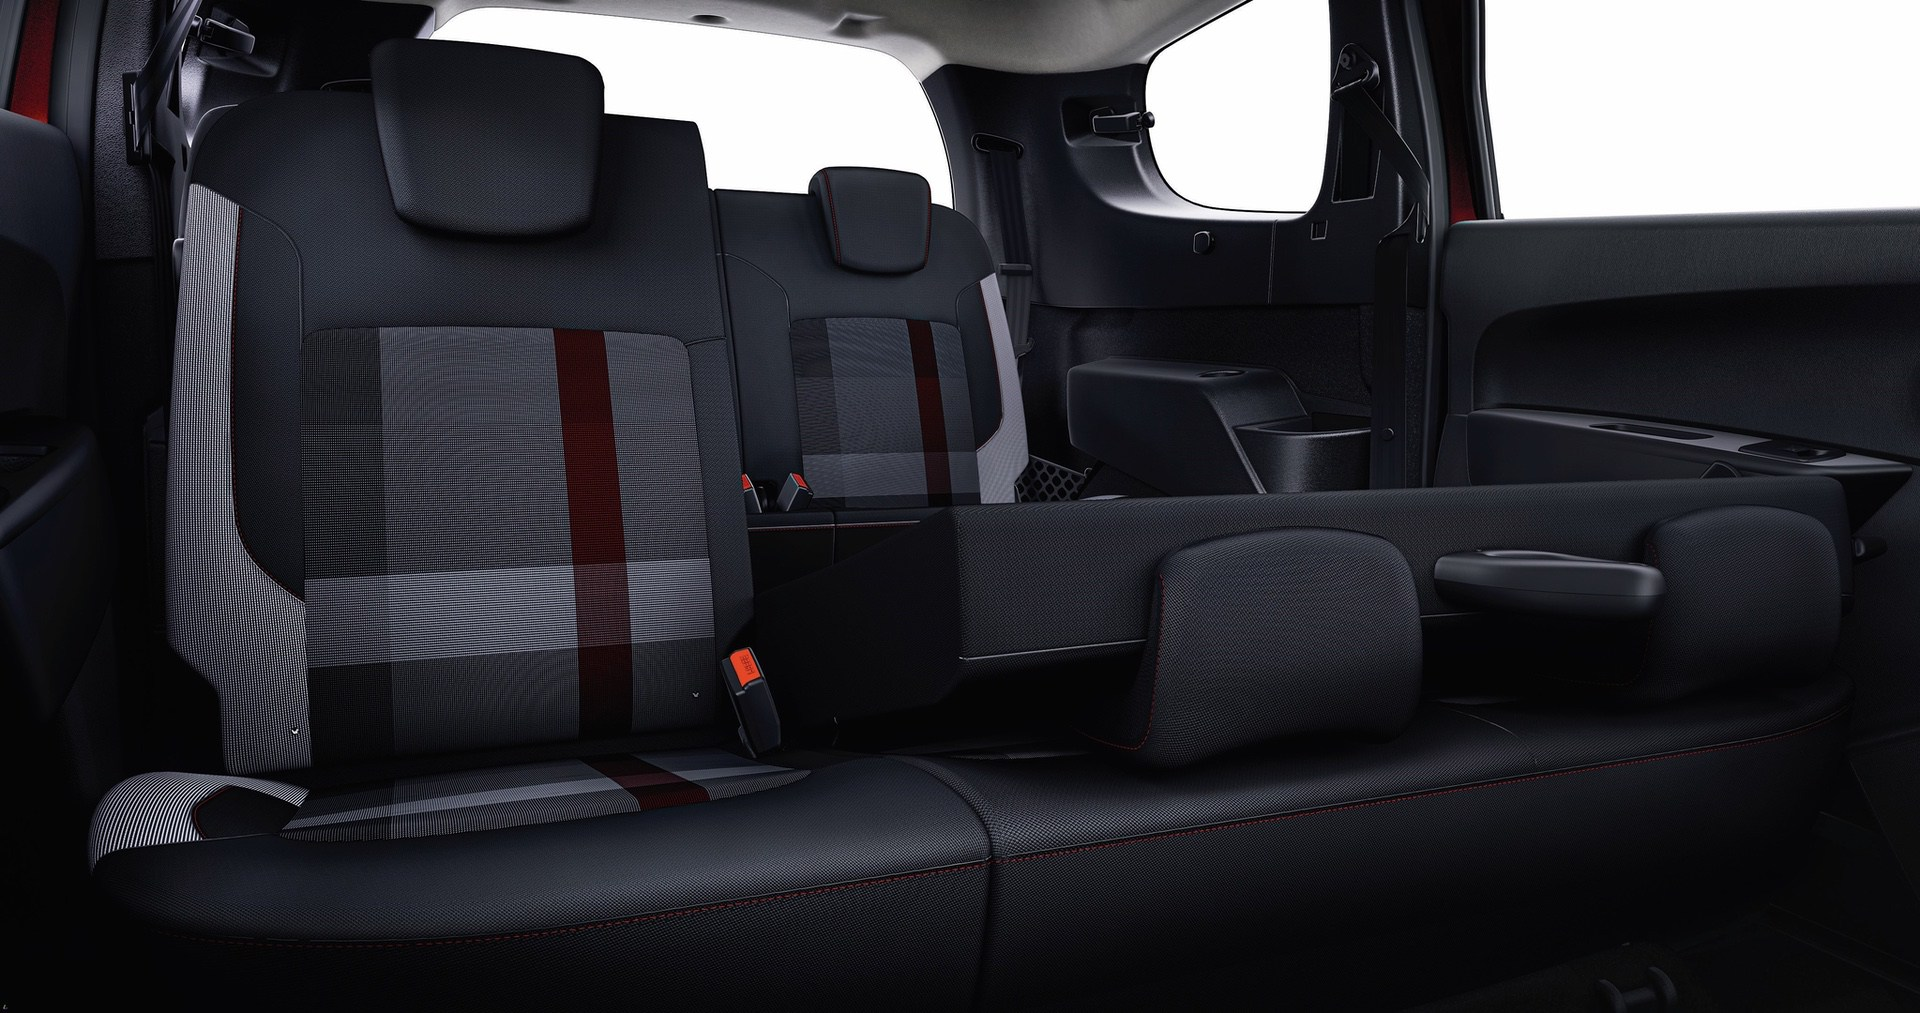 2019 - Dacia LODGY STEPWAY Série Limitée Ultimate (ou Techroad)